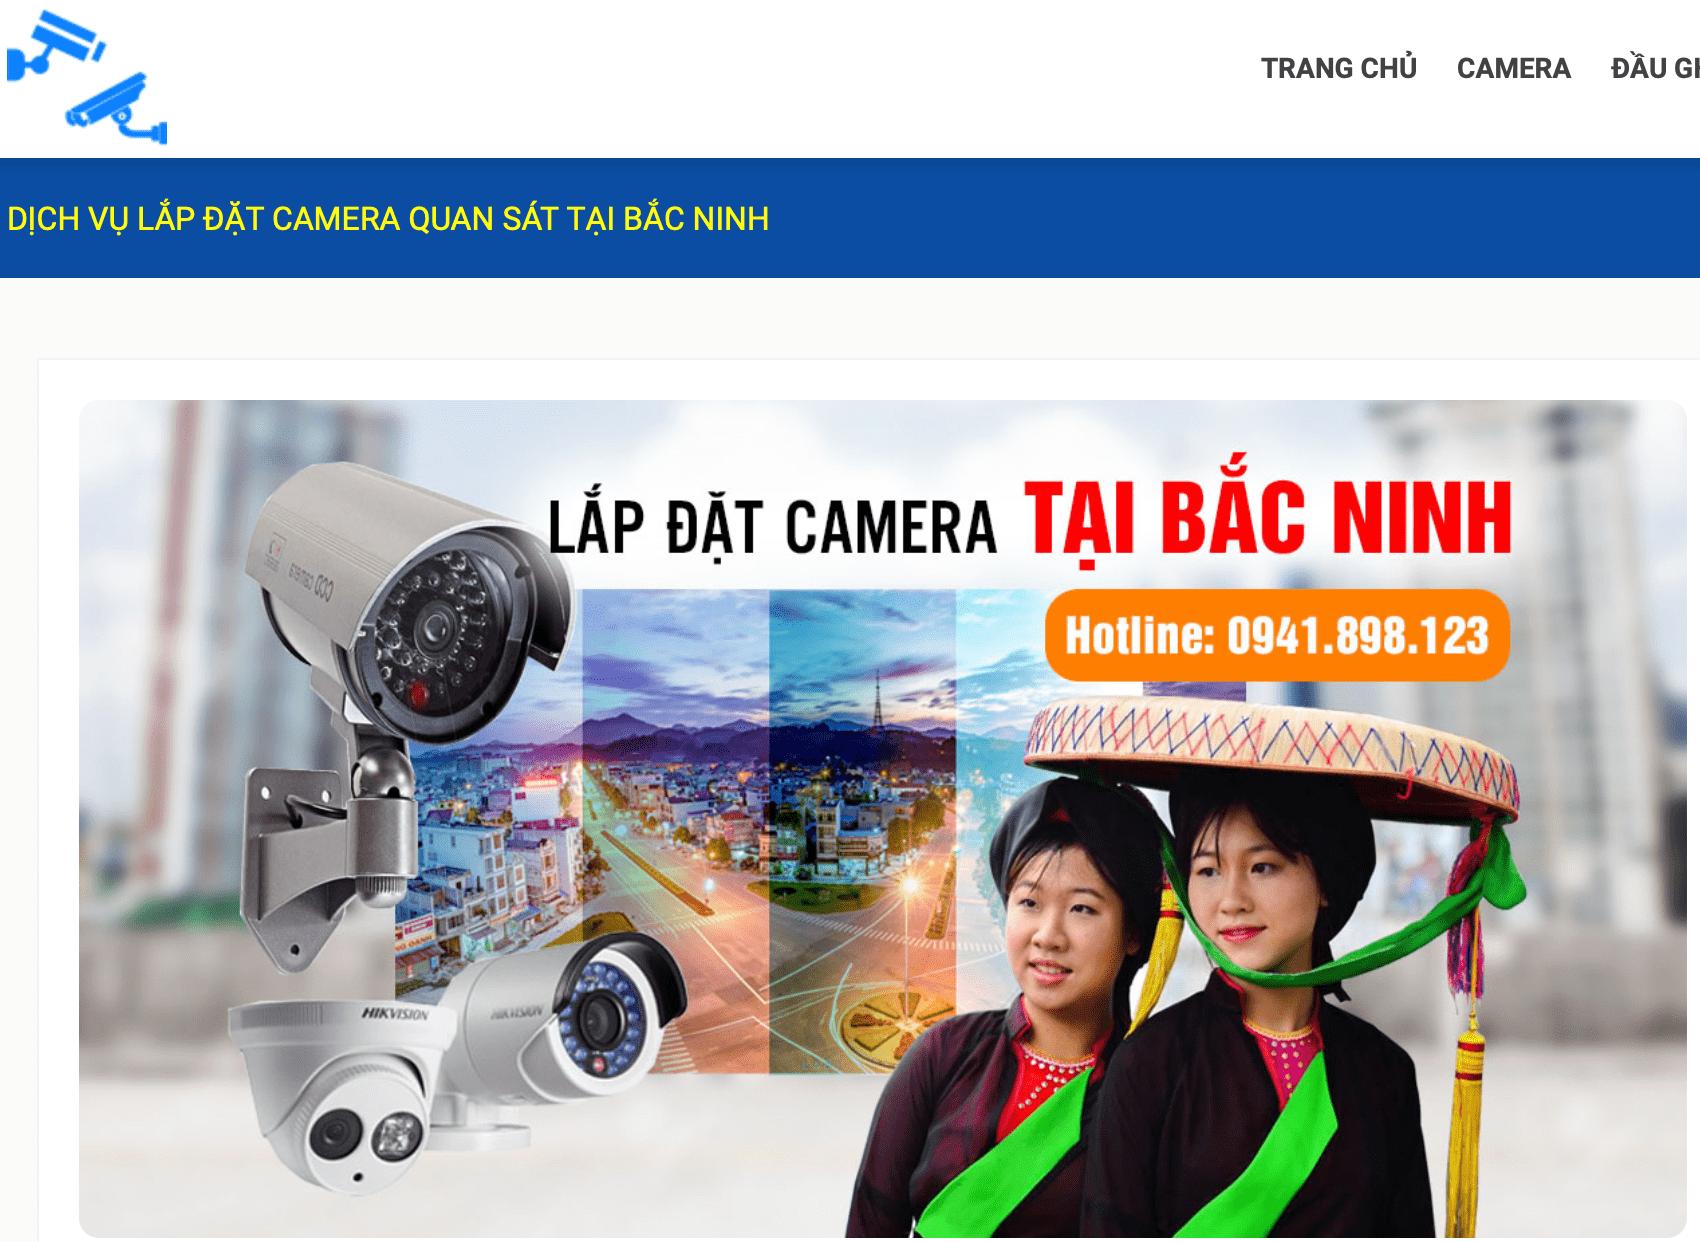 FPT Bắc Ninh